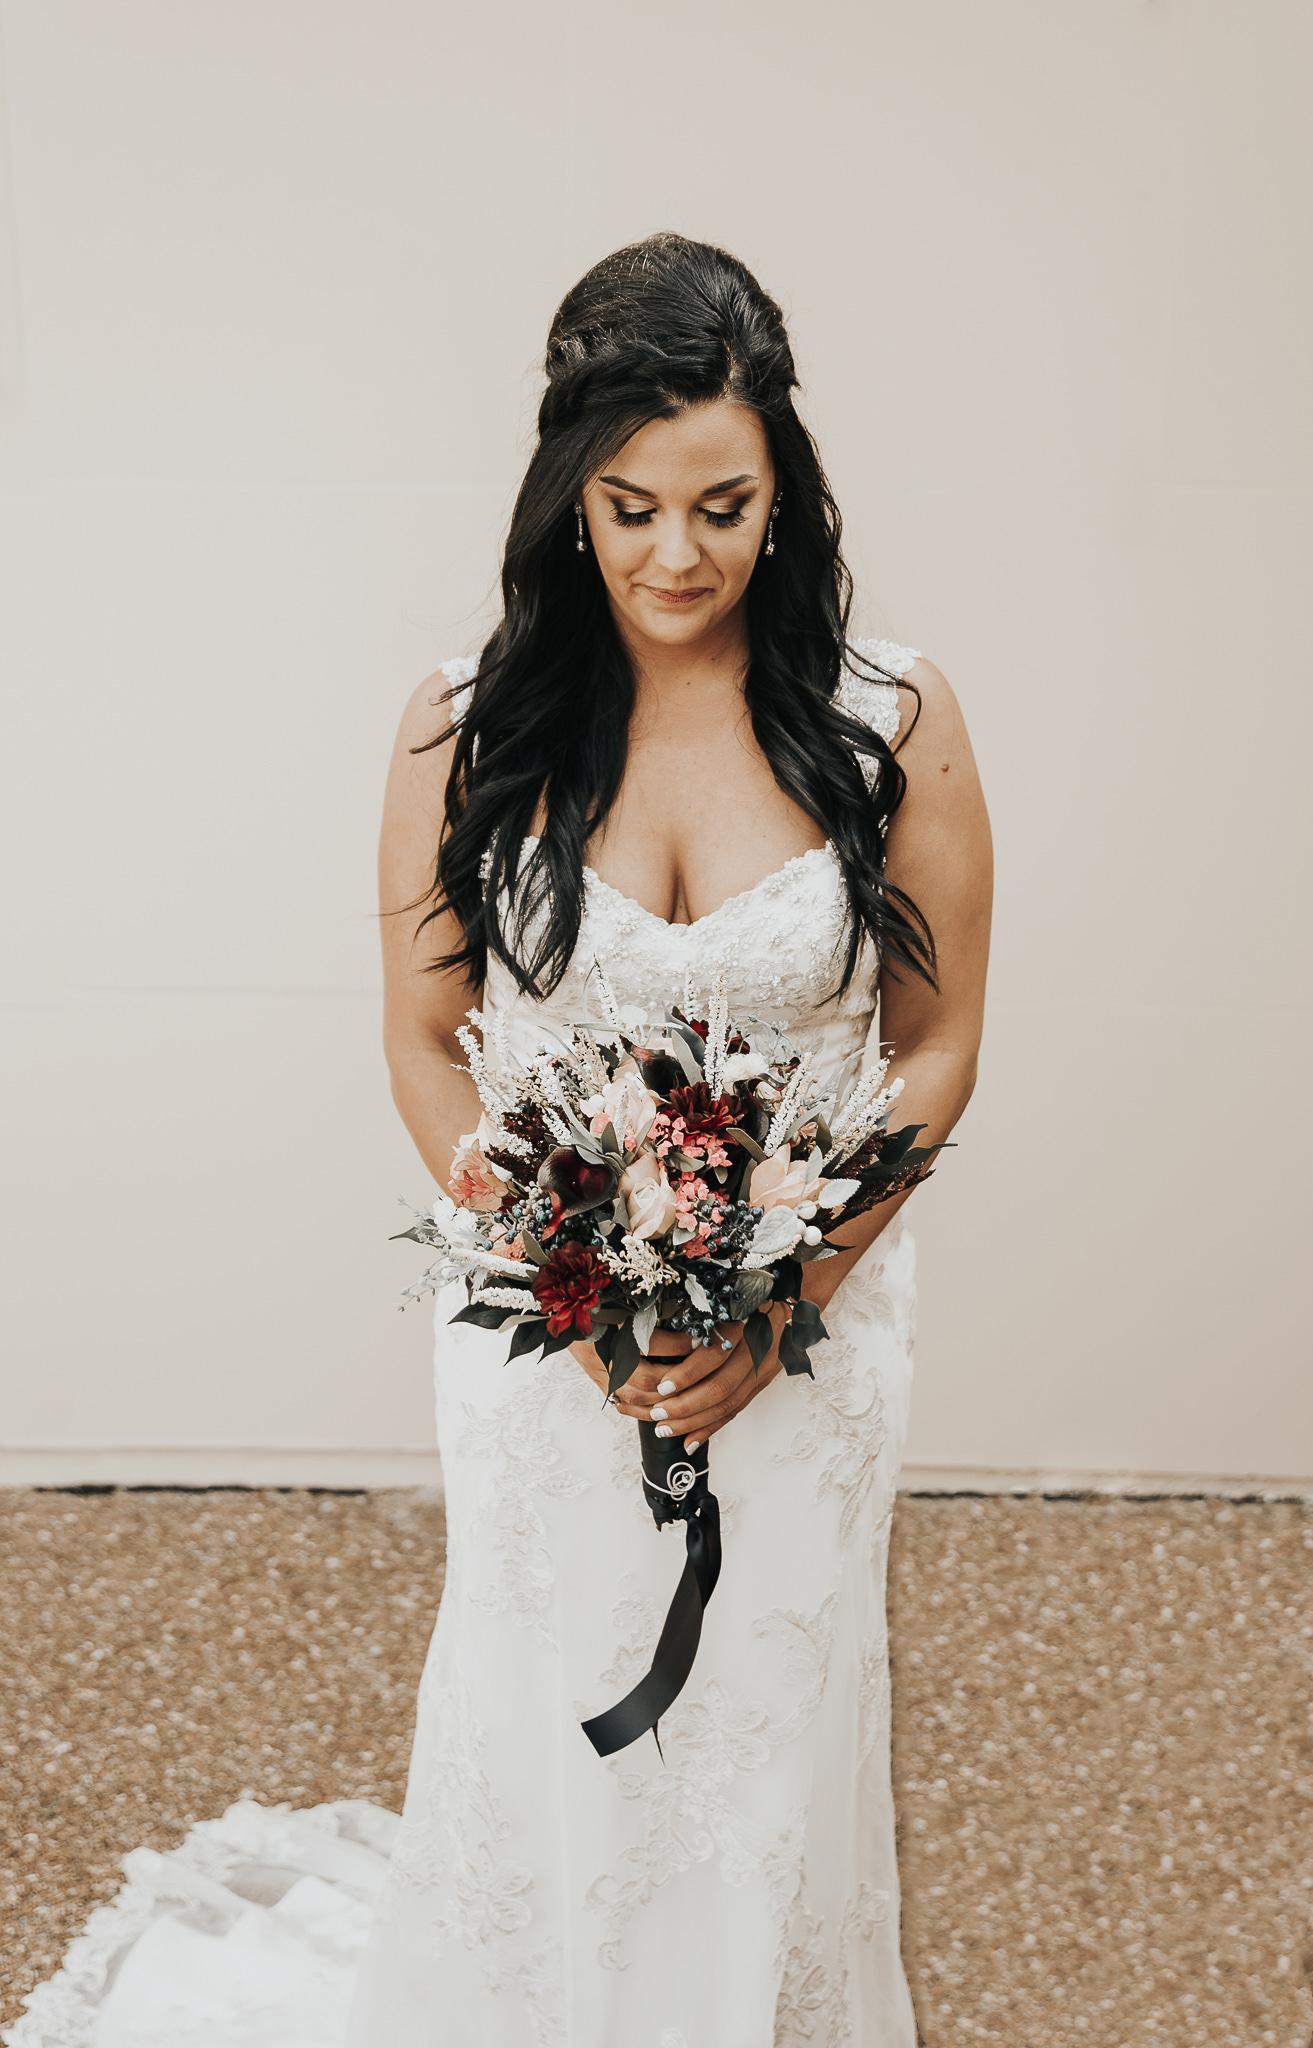 Bride-21.jpg